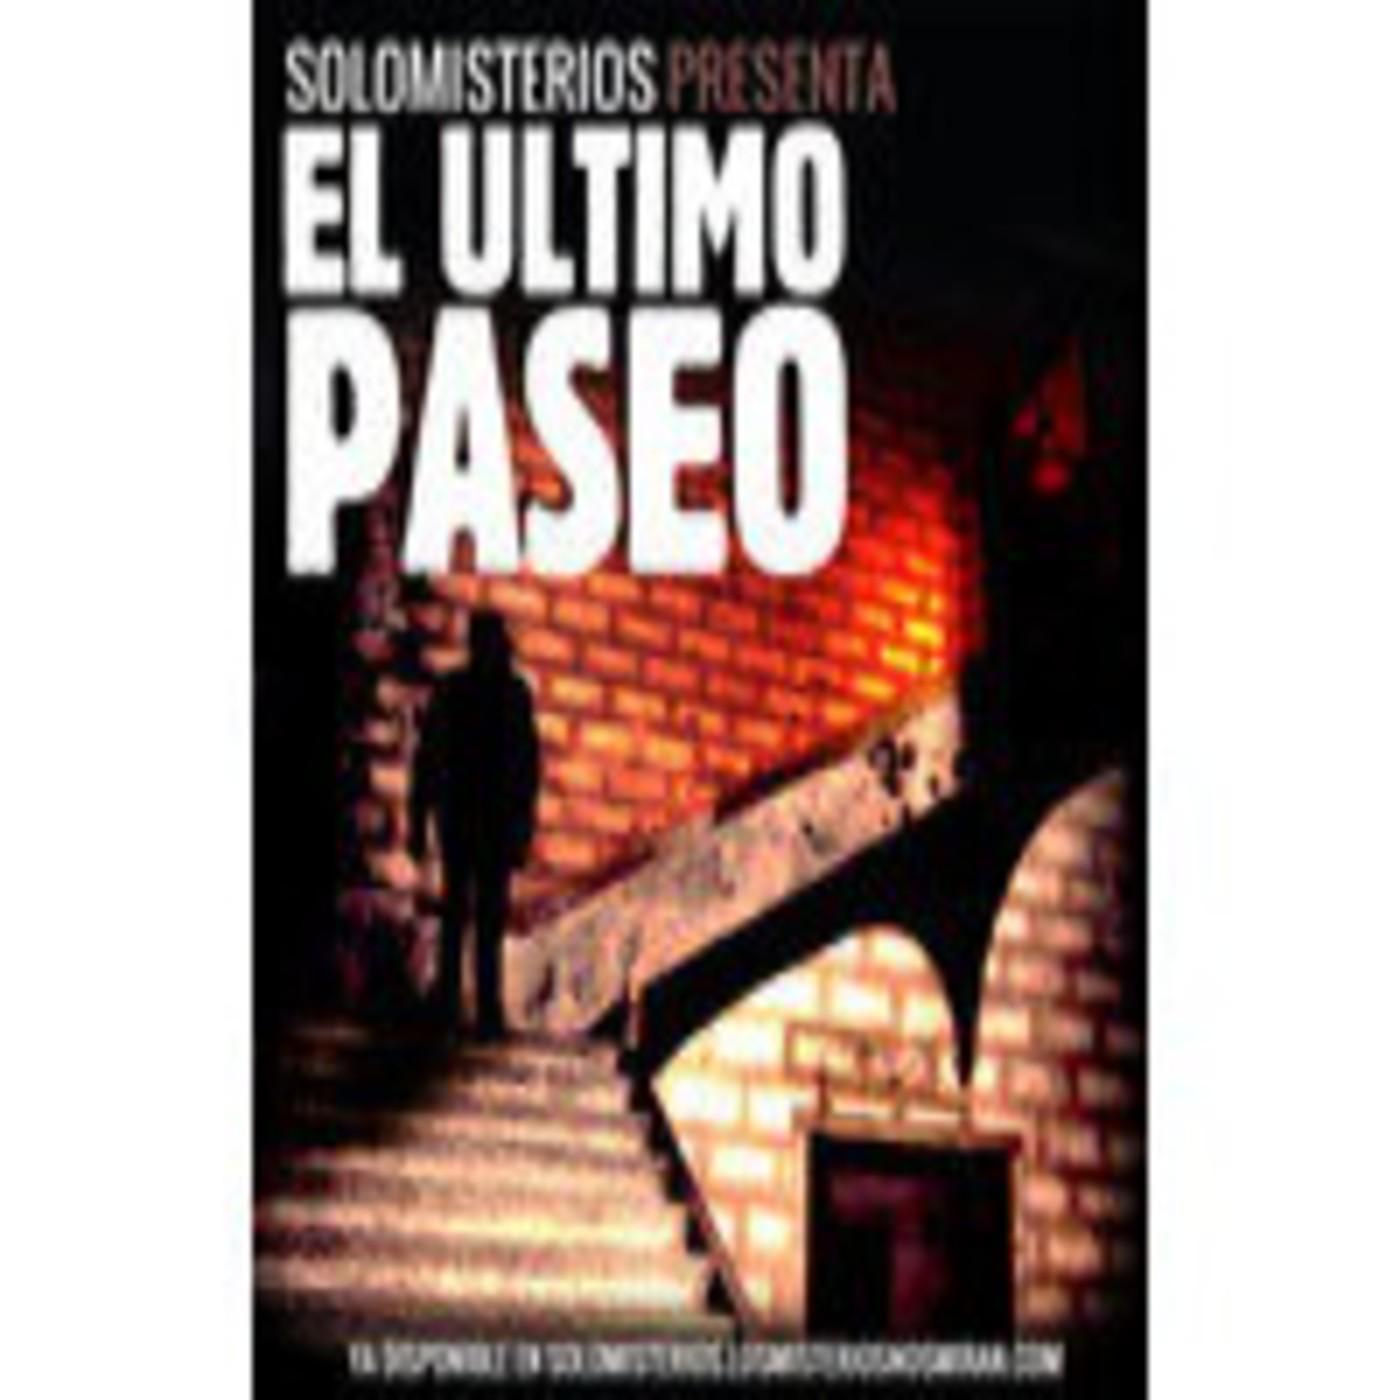 Solomisterios Nº8: 'El Último paseo Completo'